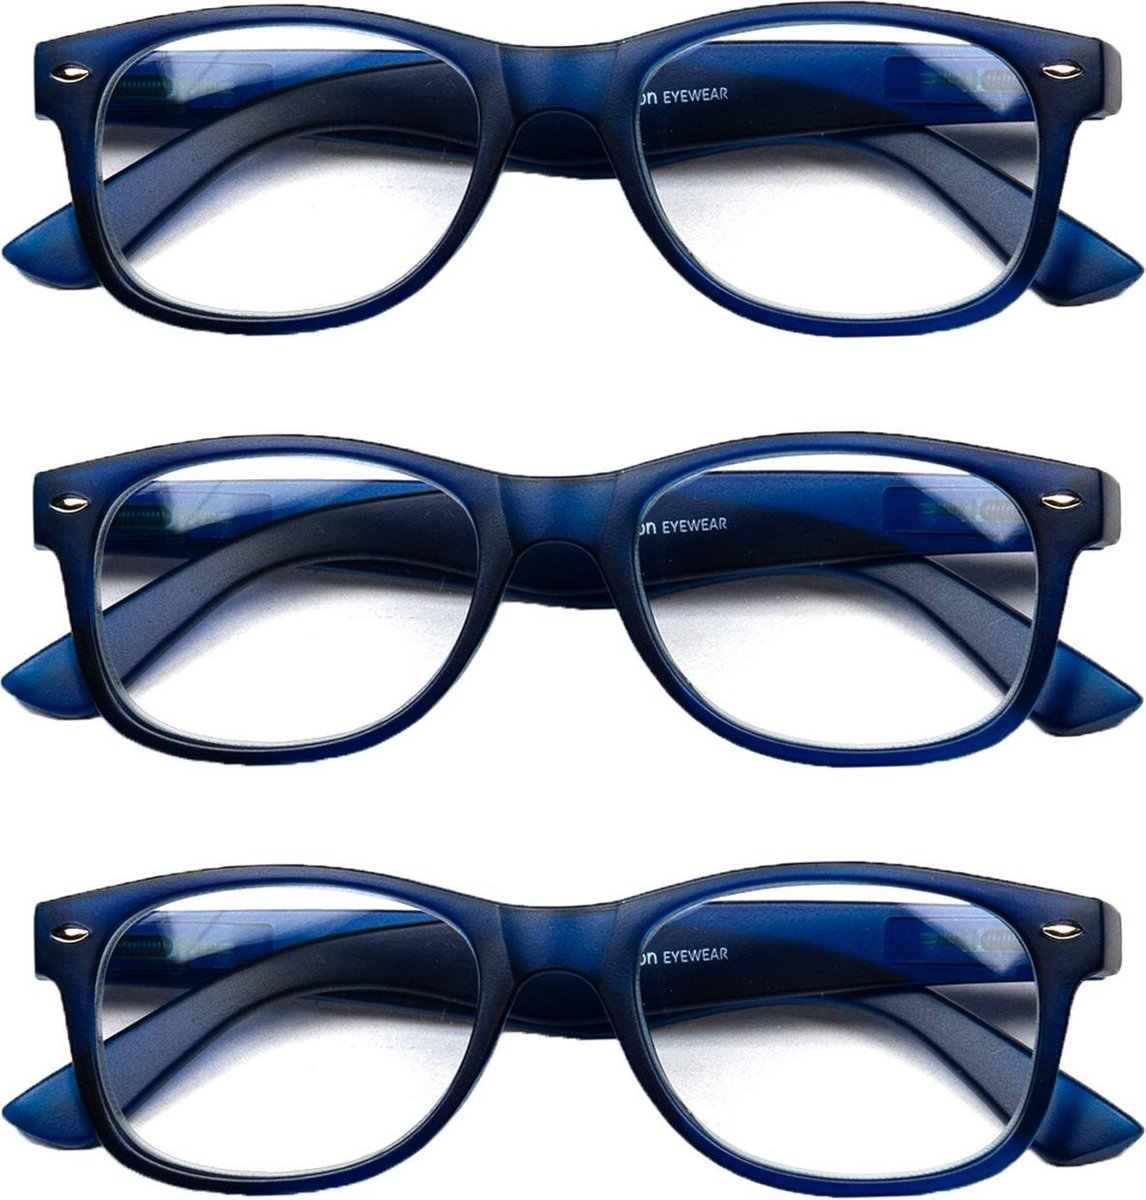 Melleson Eyewear leesbril mat blauw +1,50 - 3 stuks - incl. pouche kopen